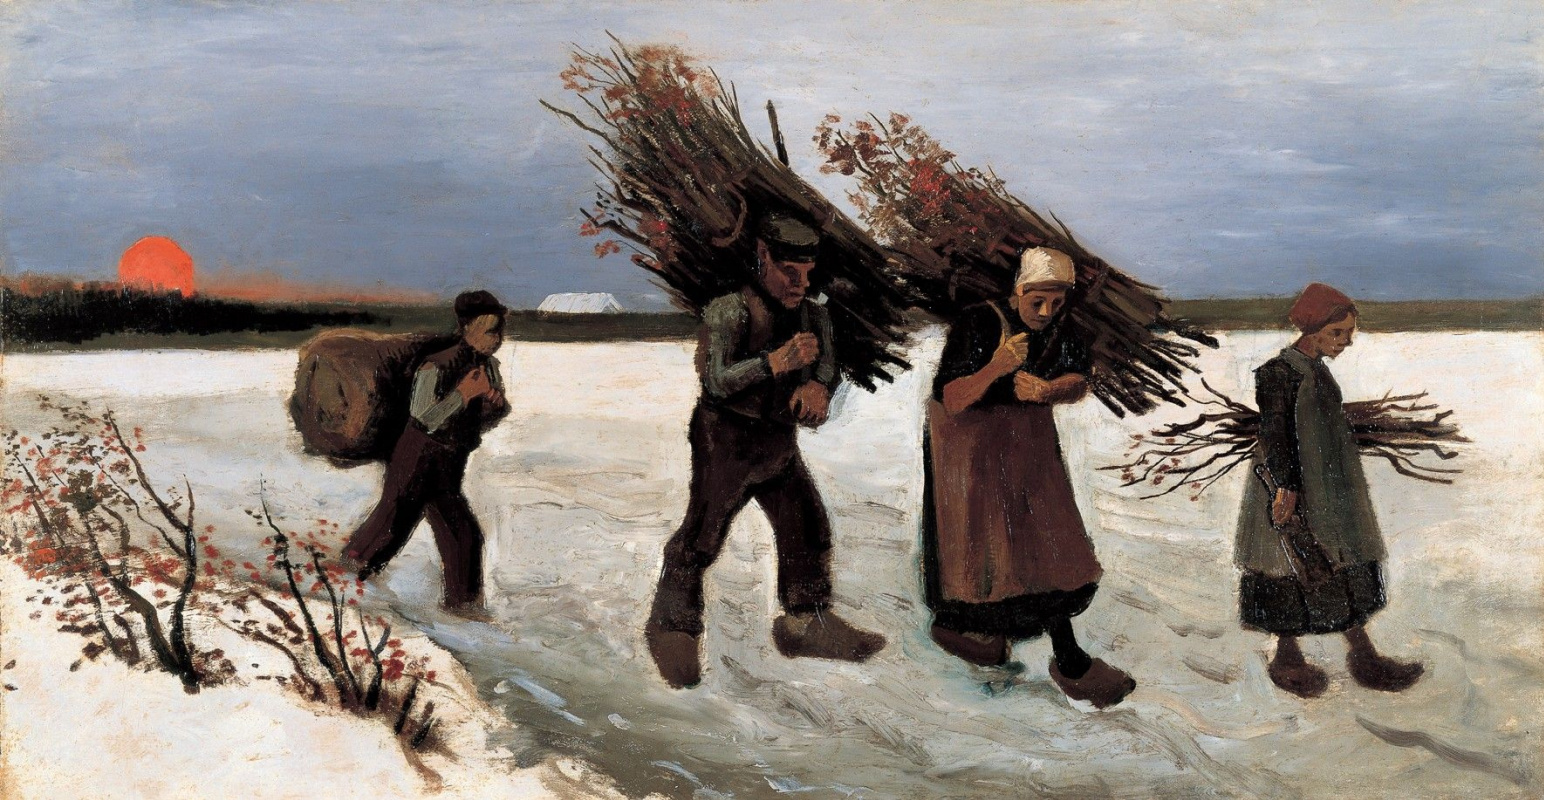 Винсент Ван Гог. Собиратели хвороста на снегу